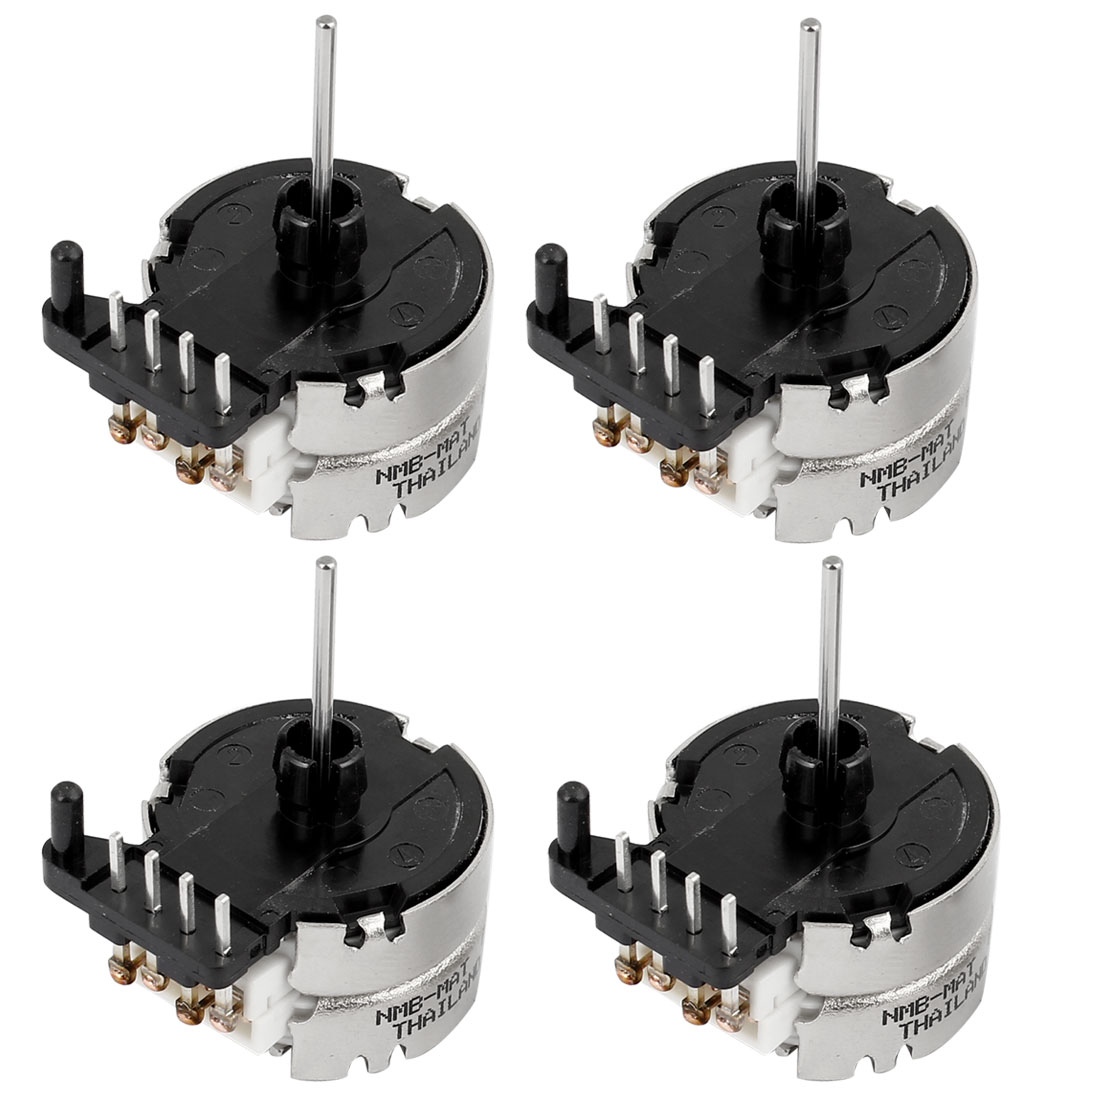 4 Pcs Cluster Tachometer Odometer Gauge Instrument Stepper Motors PM20T-036